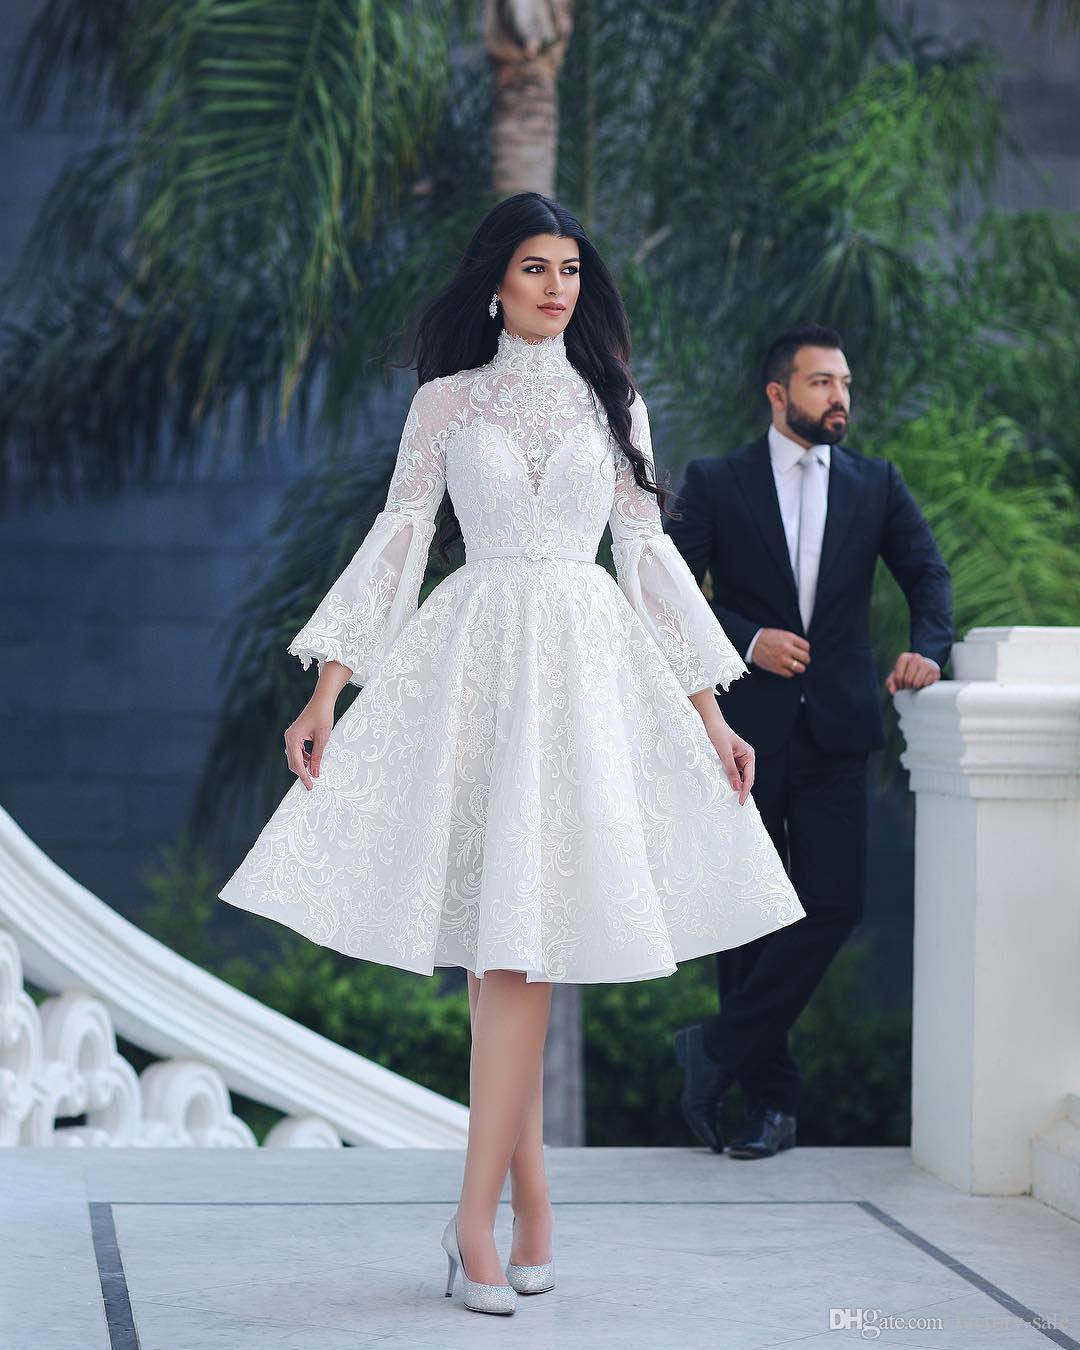 2725b07aad Discount Vintage 2018 New Wedding Dresses A Line High Jewel Neck Long Bell  Sleeves Knee Length Wedding Dress Bridal Gowns Vestido De Novia Empire Line  ...